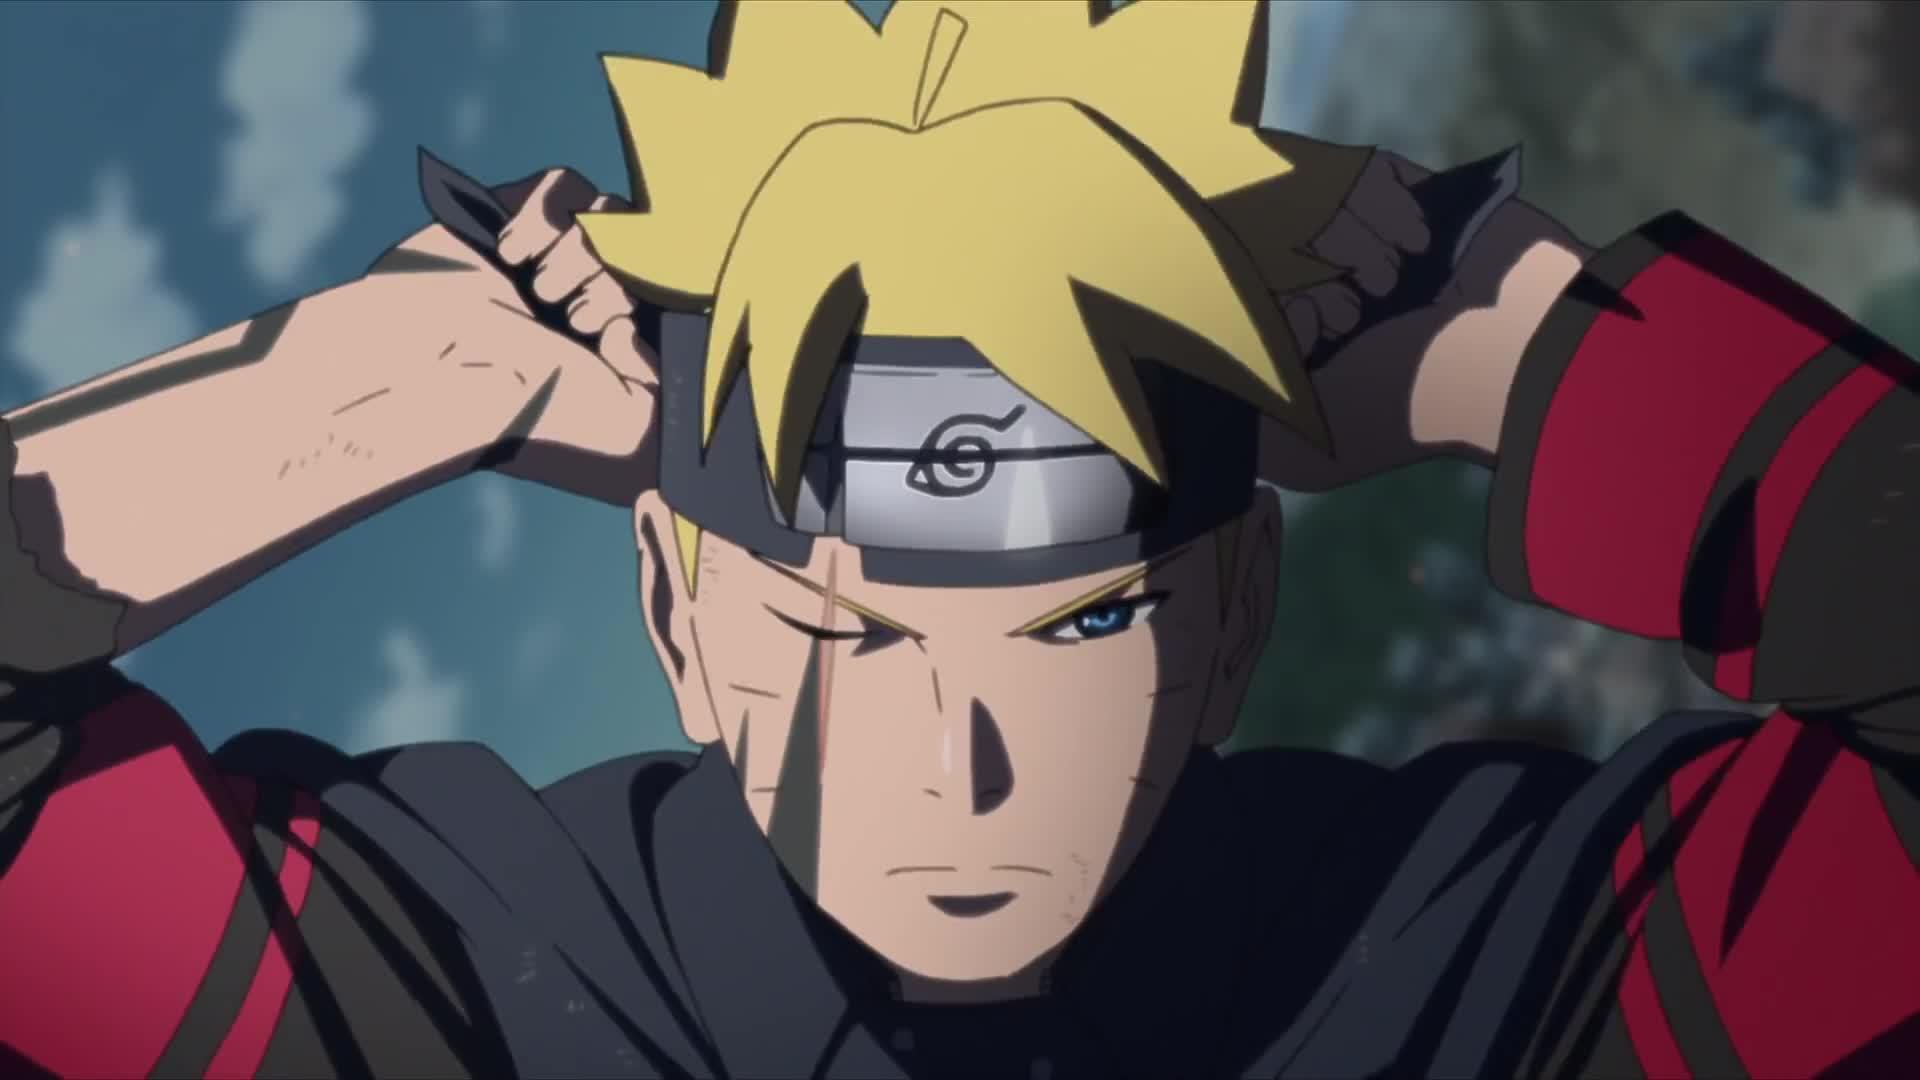 Boruto Naruto Next Generations Tv Series 2017 Imdb By amy mcnulty, nov 25th 2019. official trailer set 1